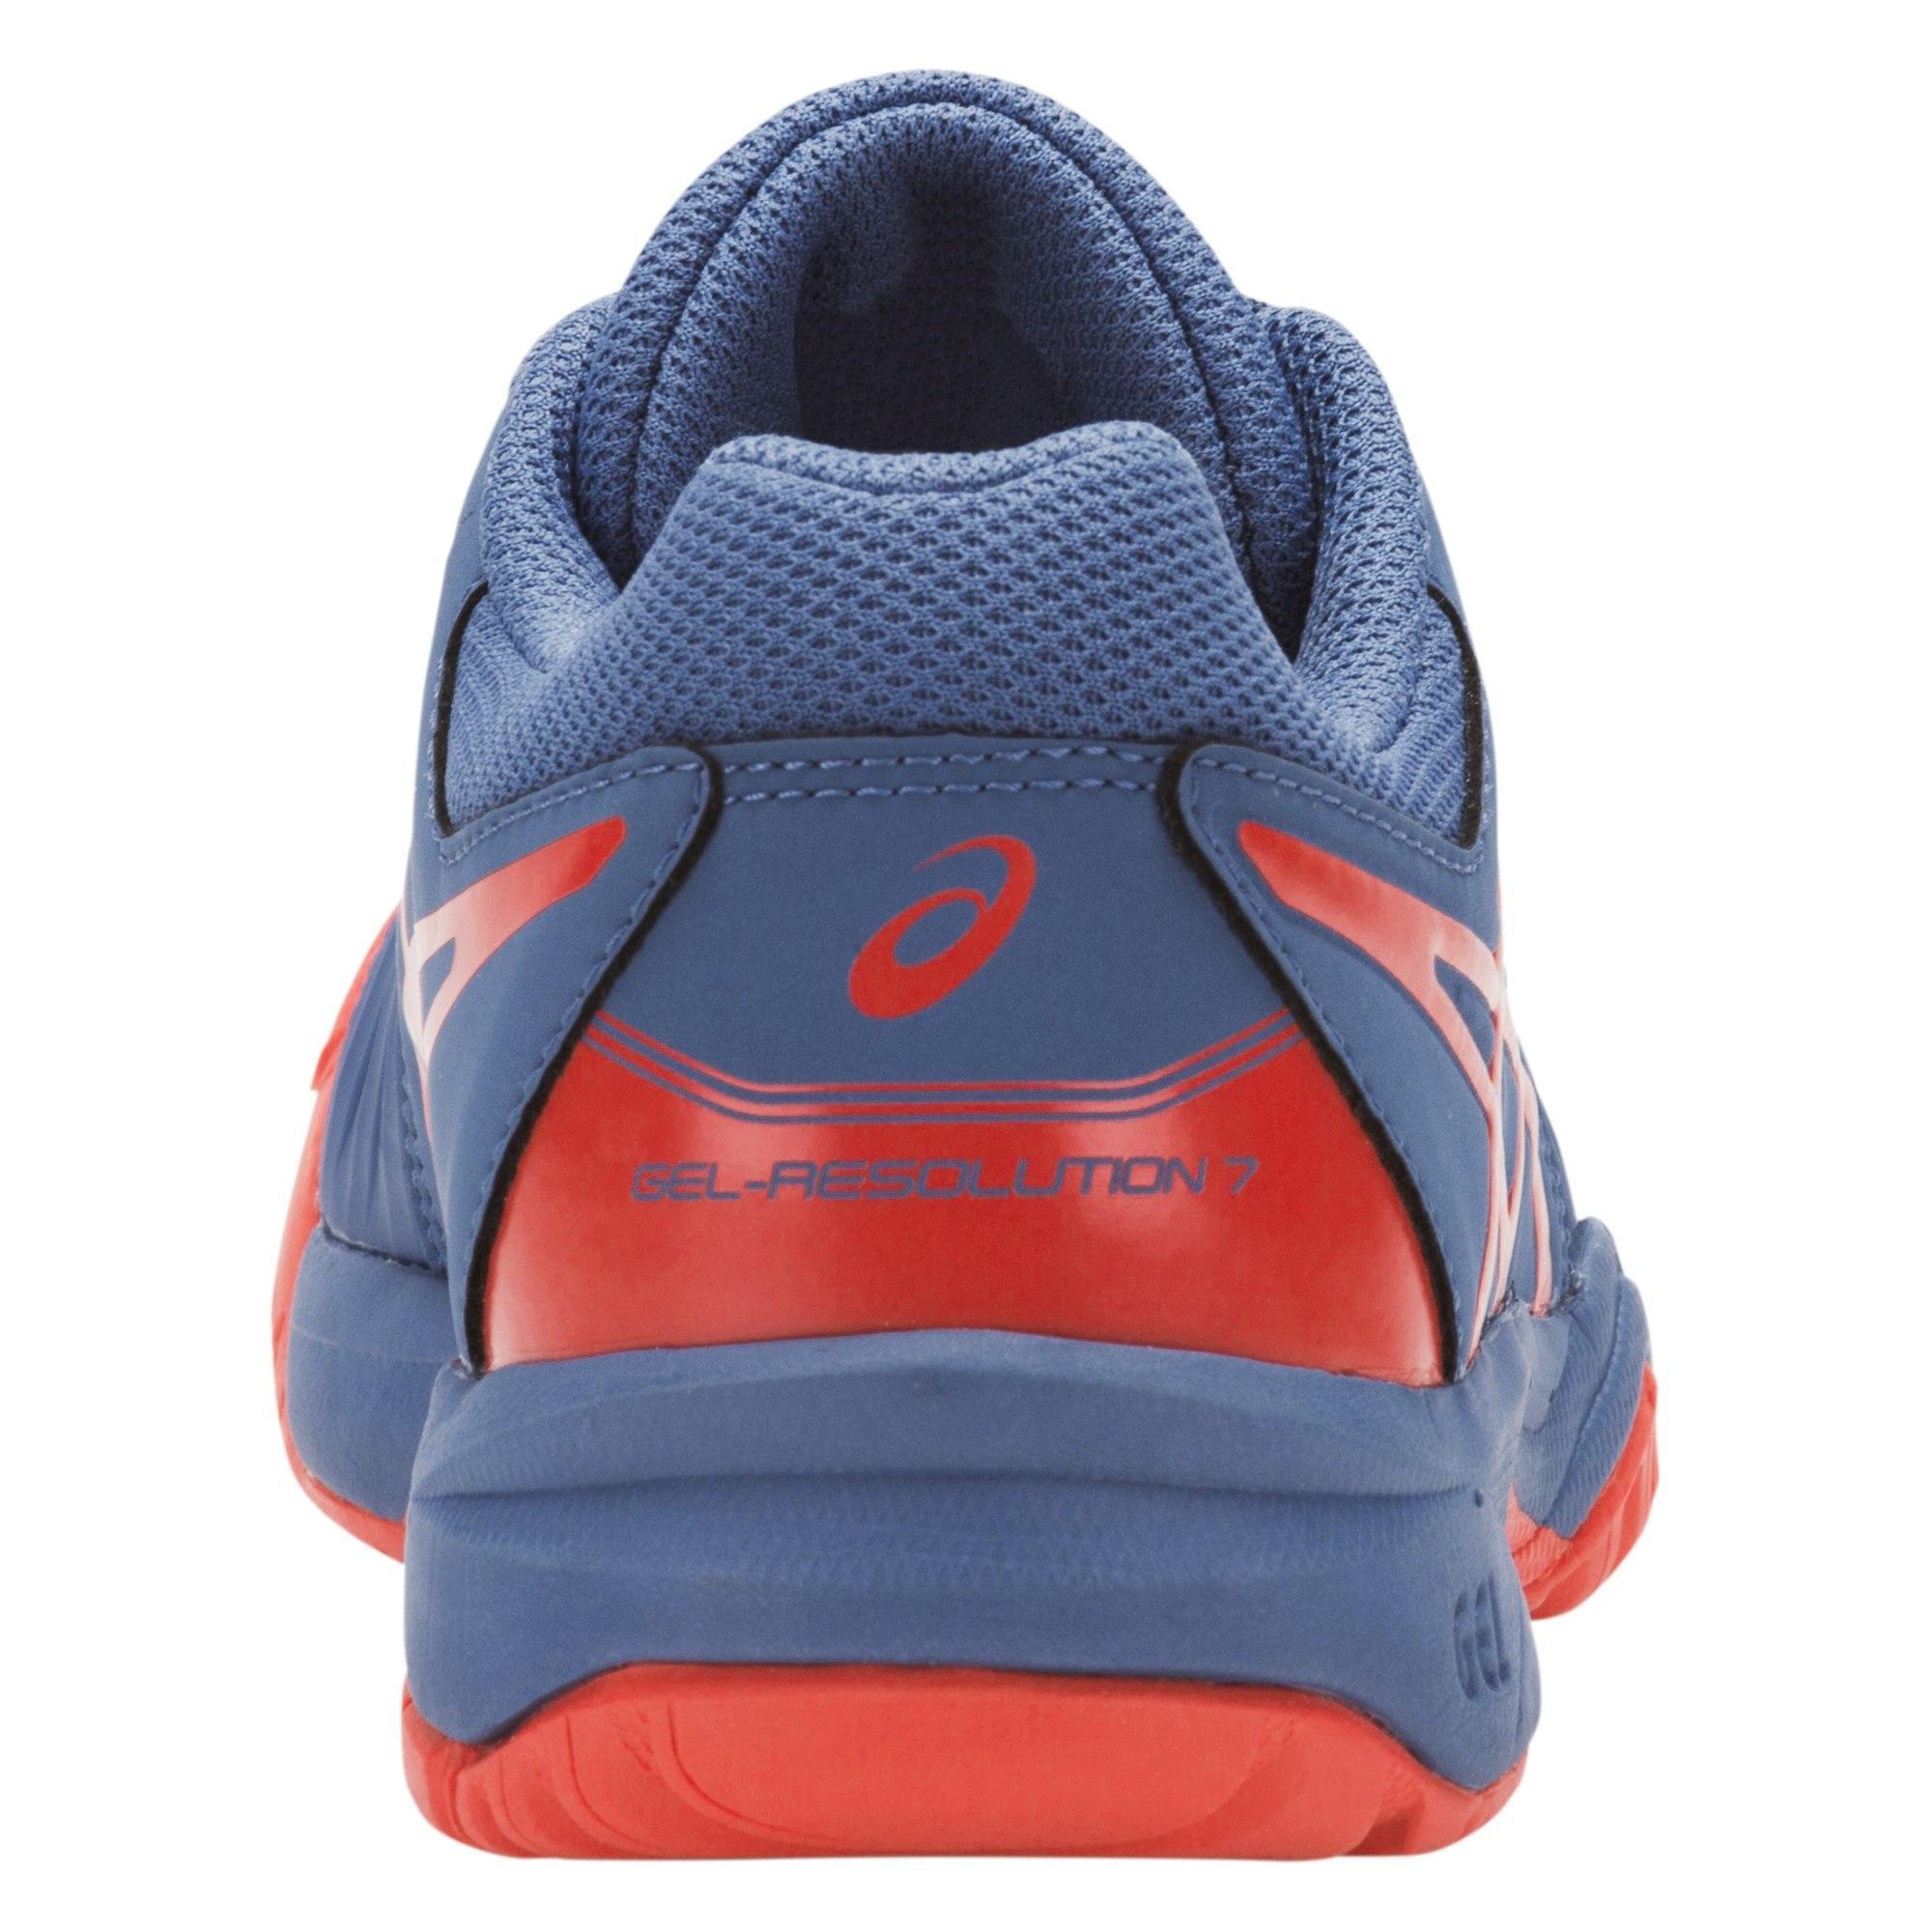 Asics Kids GEL-Resolution 7 GS Tennis Shoes - Azure Red Alert ... 8423f27b3ae